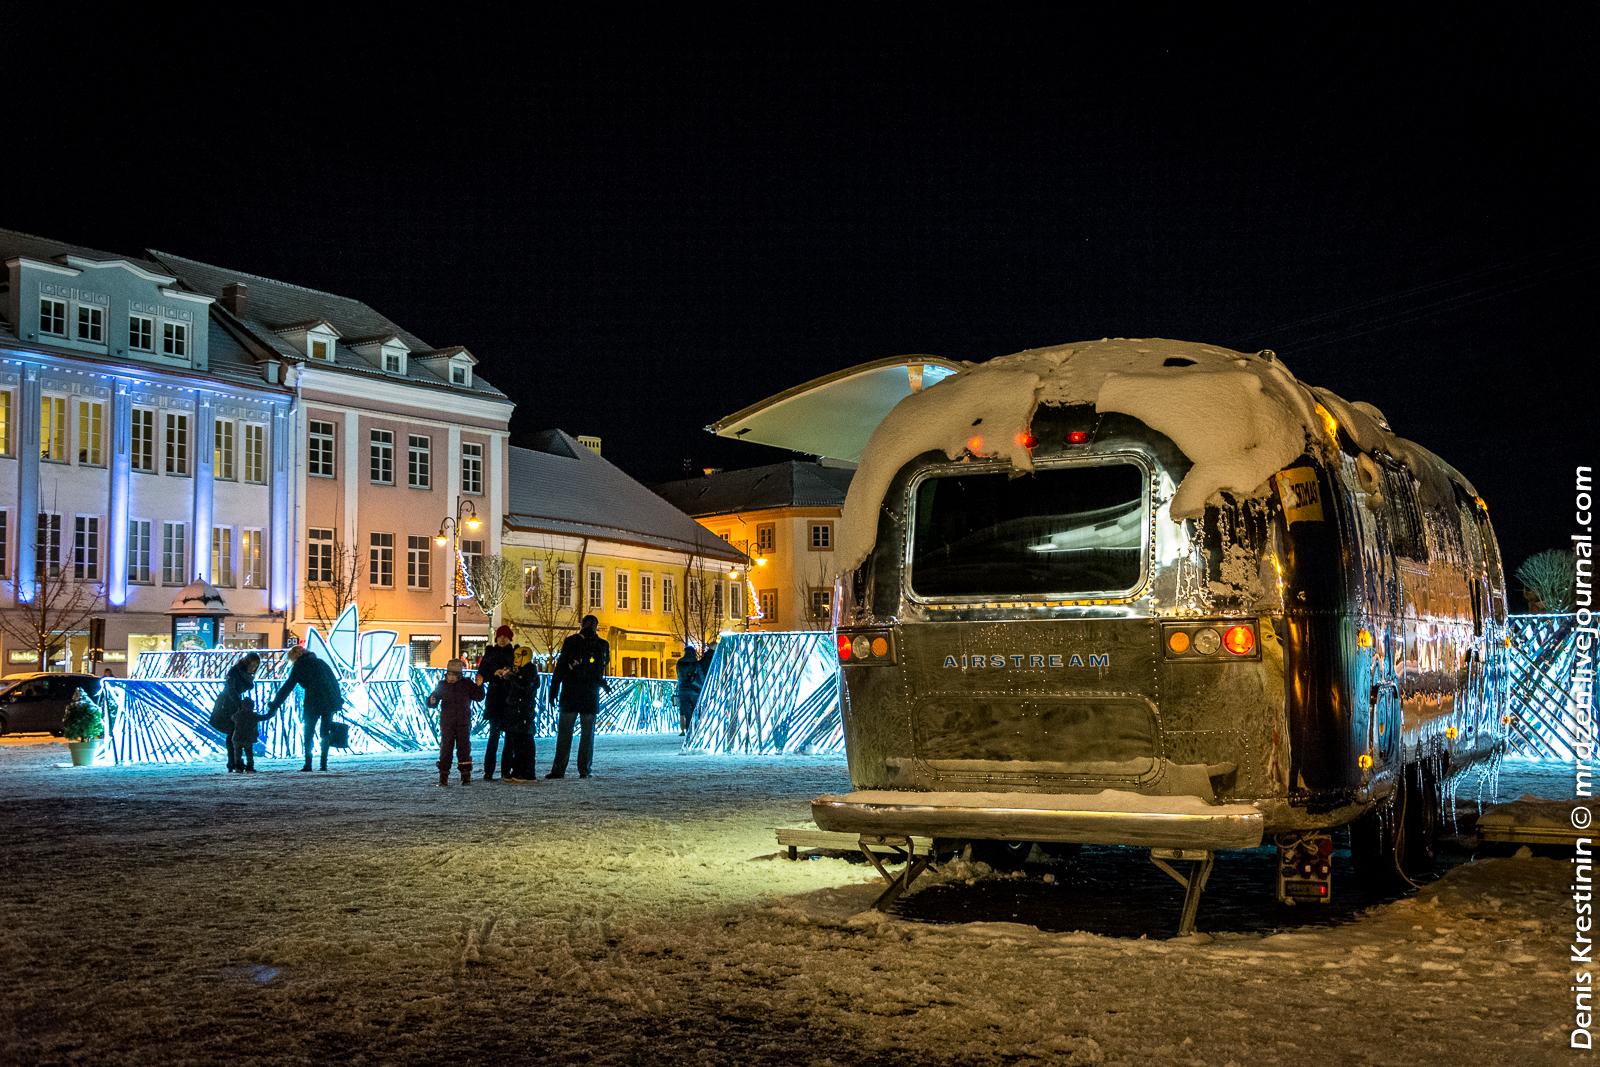 Вильнюс. Ратушная площадь. Трейлер Airstream.